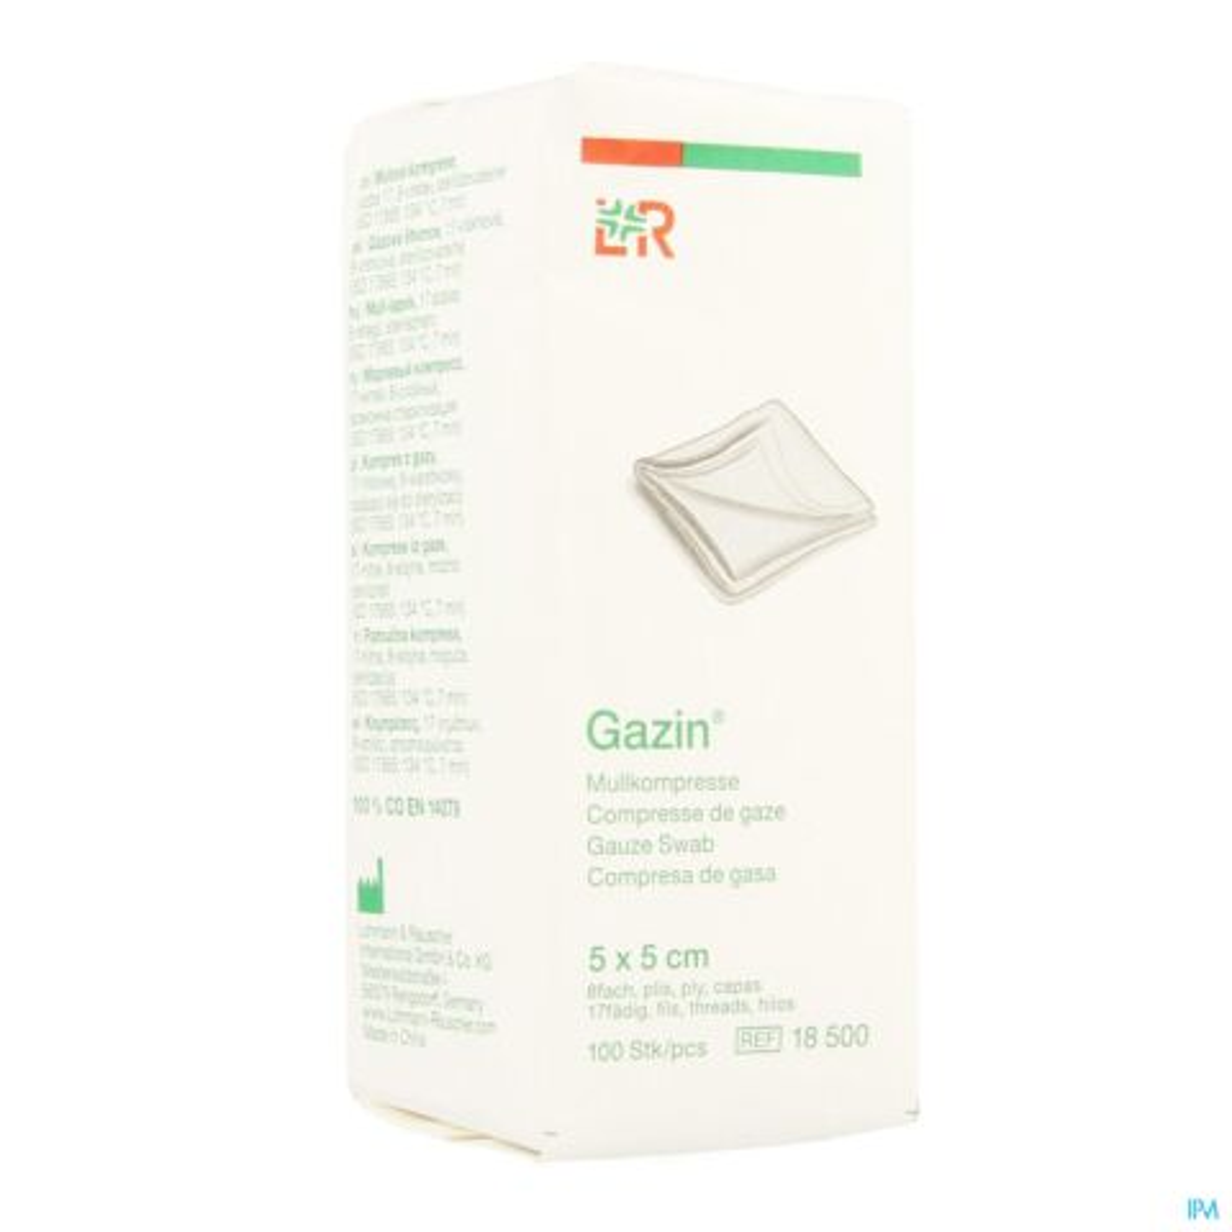 GAZIN KP N/STER 8P 5,0X 5,0CM 100 18500